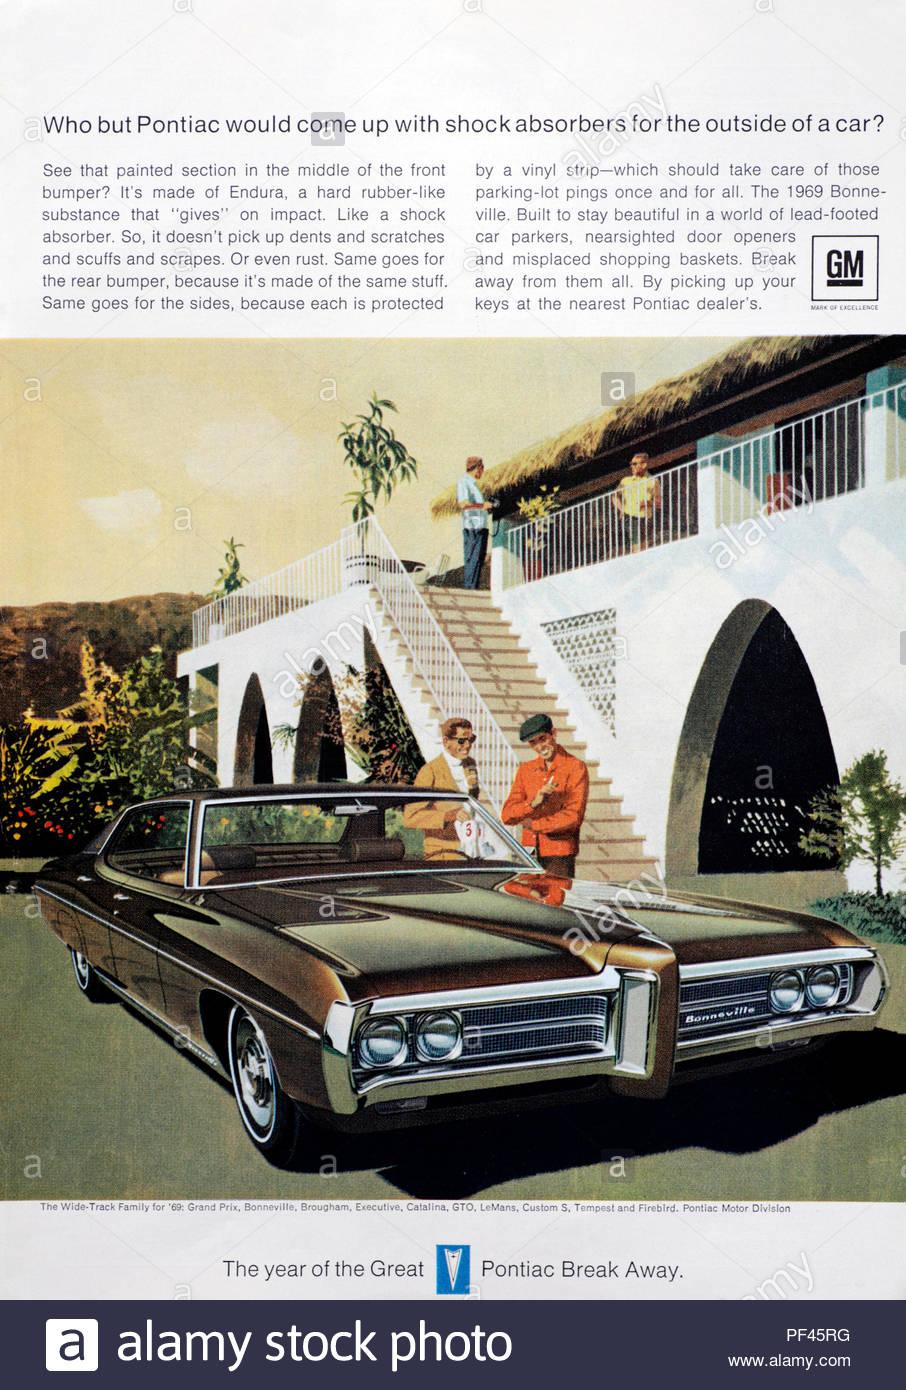 Vintage advertising for the Pontiac Bonneville Car 1969 - Stock Image